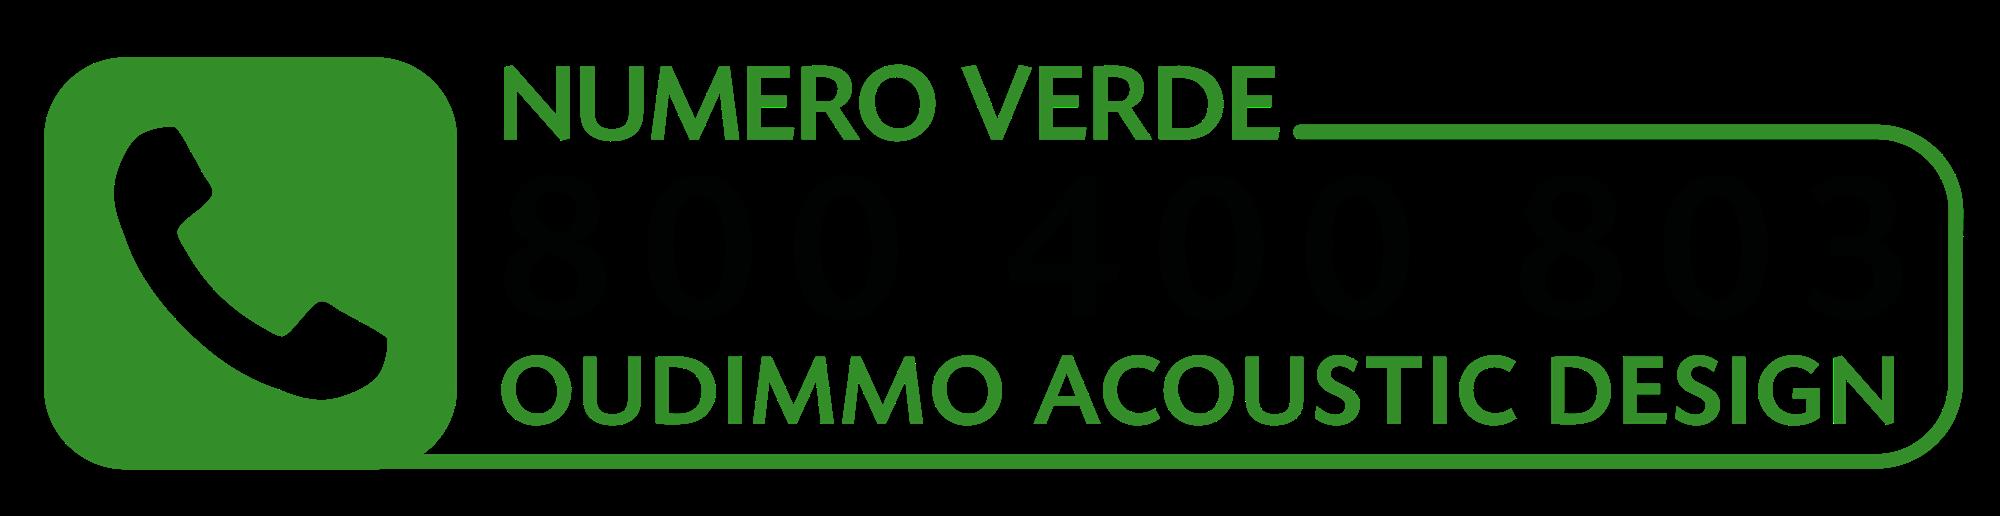 NUMERO VERDE OUDIMMO ACOUSTIC DESIGN - Oudimmo Acoustic Design